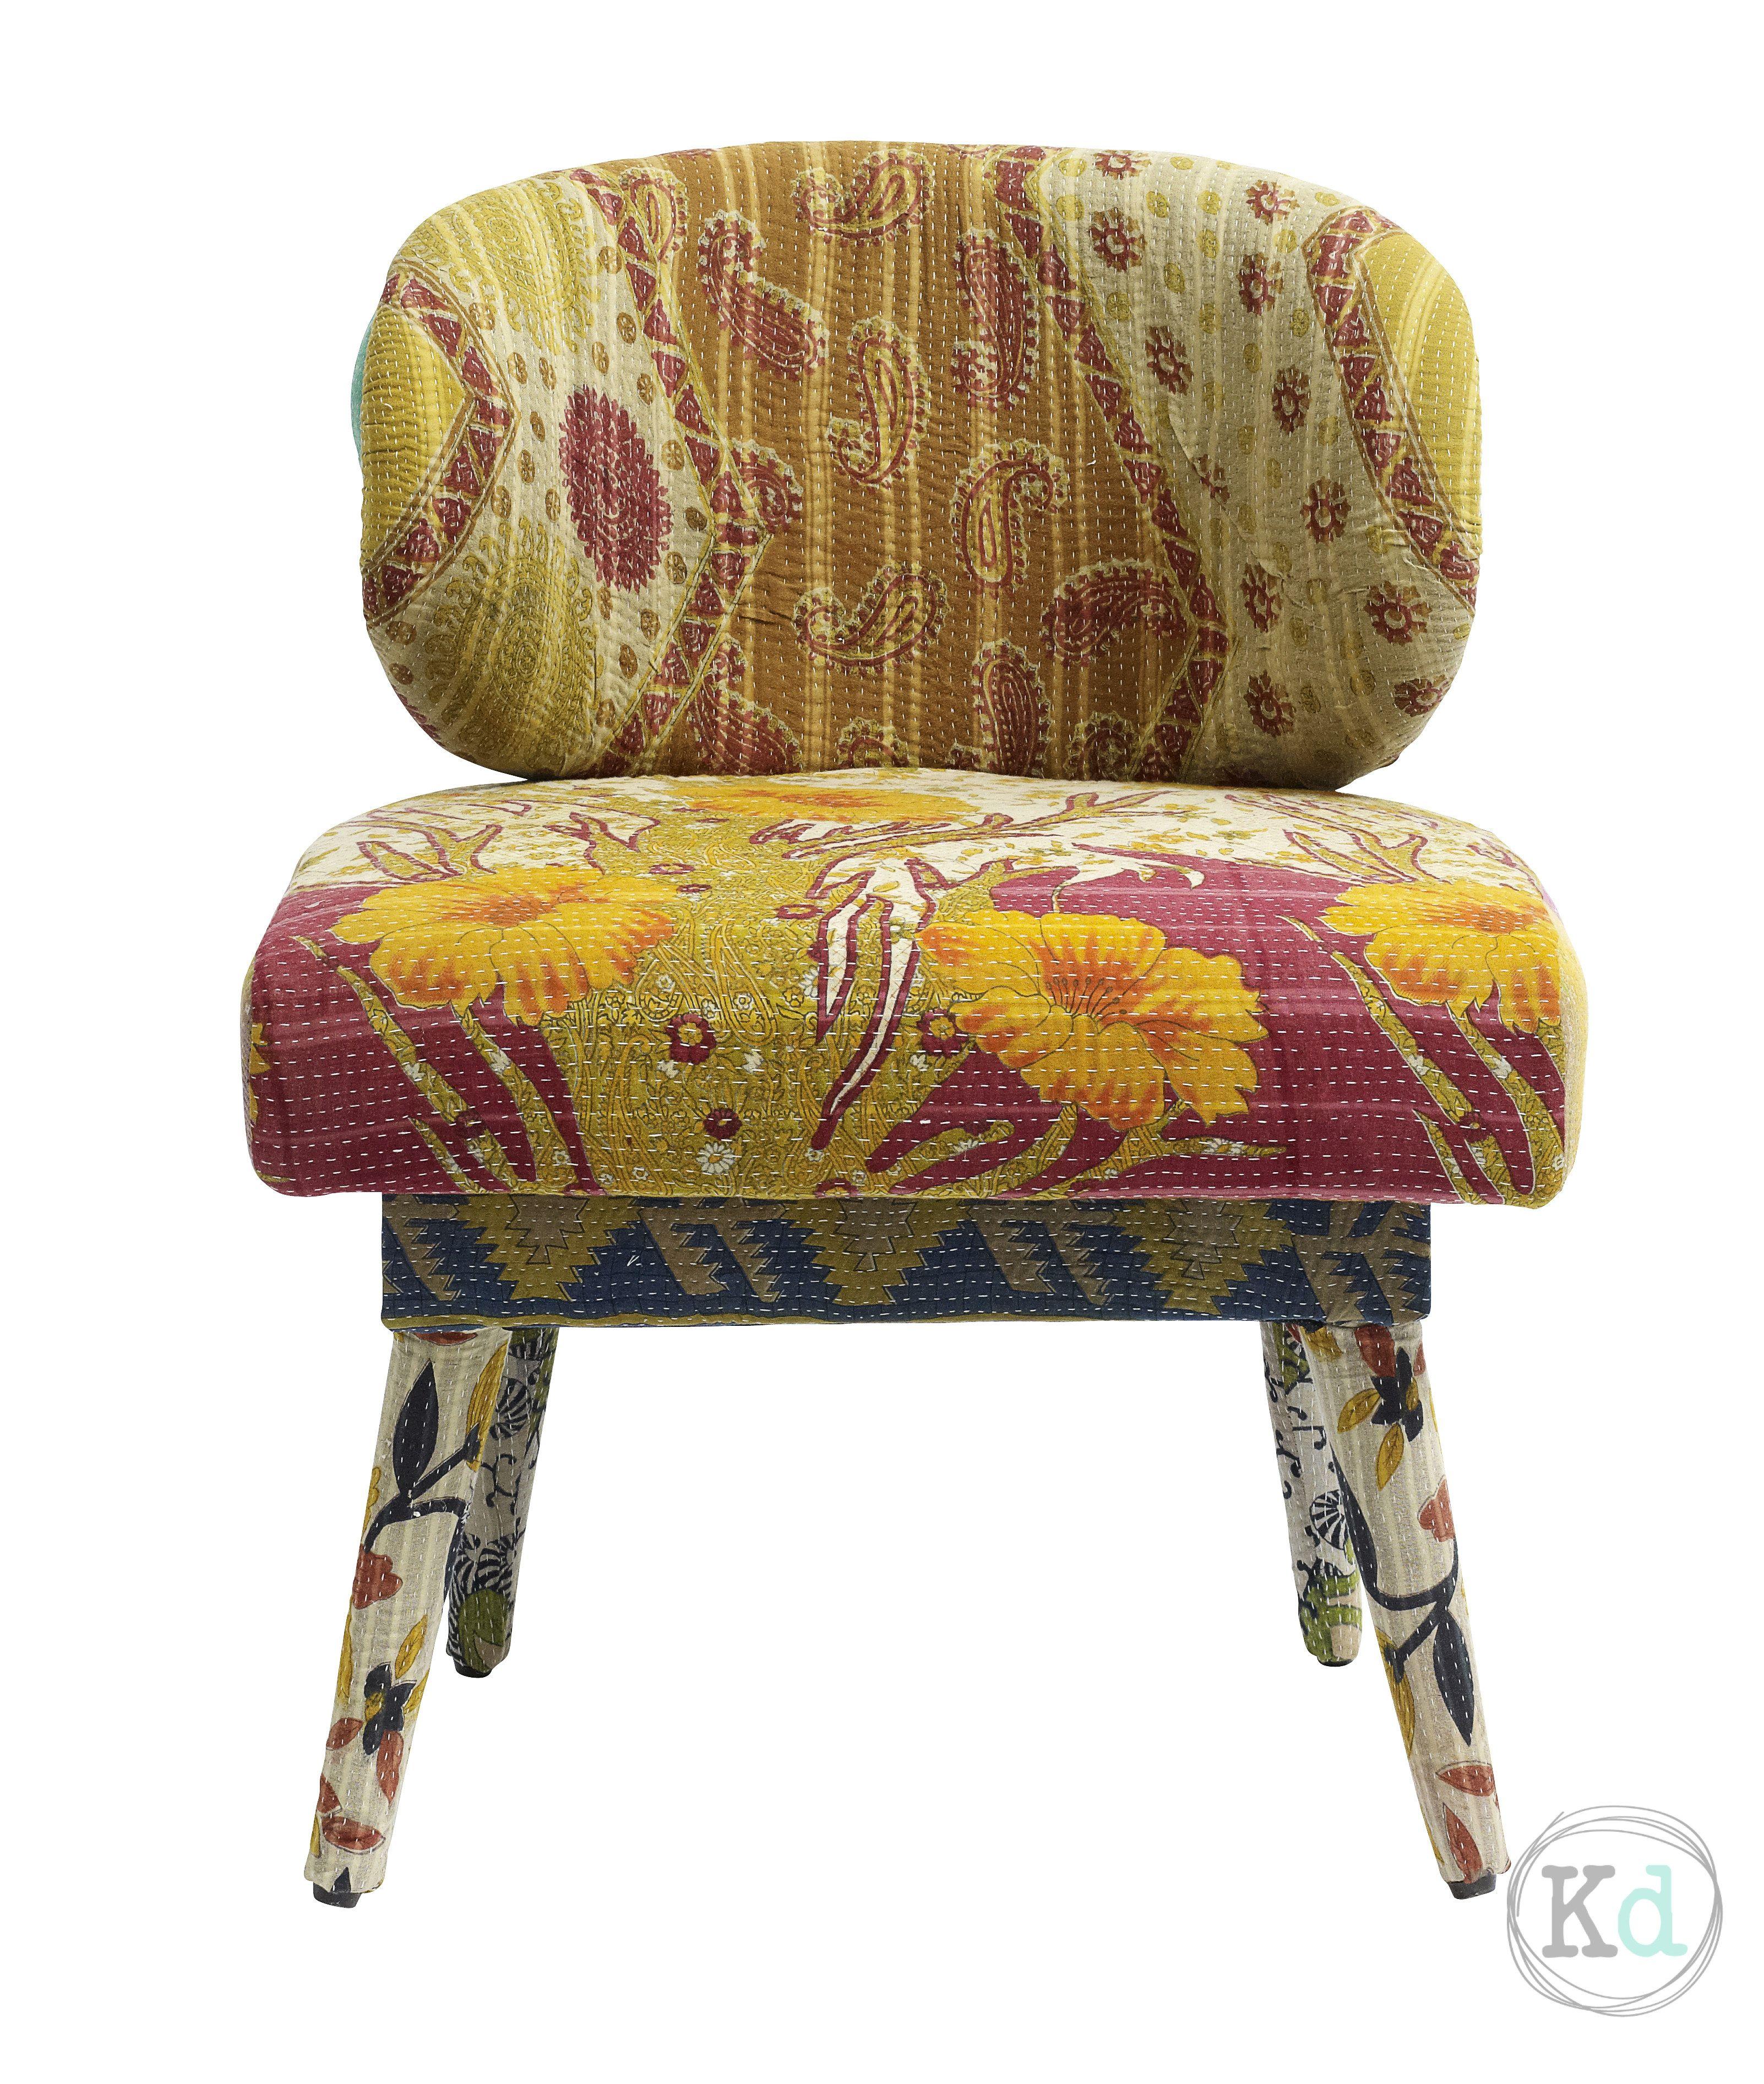 Selecci N De Muebles De Nordal En Kulunka Deco Shop Nordal En  # Muebles Kulunka